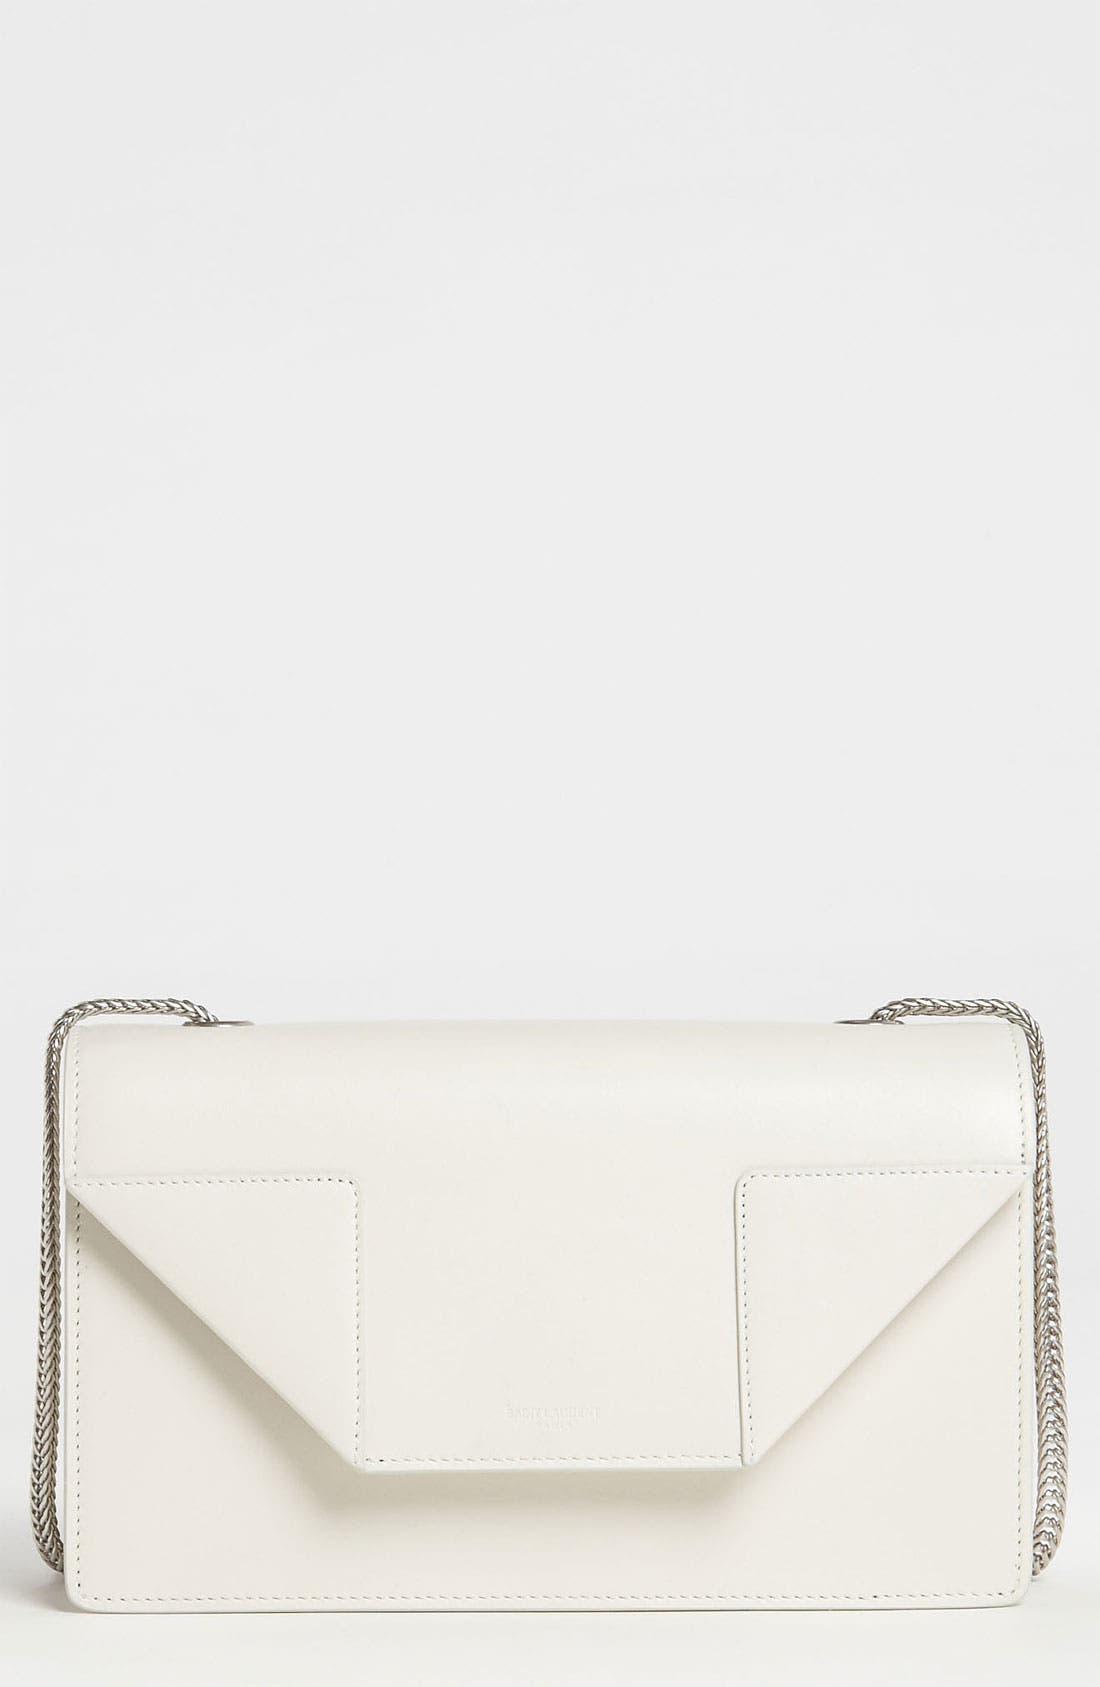 Alternate Image 1 Selected - Saint Laurent 'Betty - Mini' Shoulder Bag